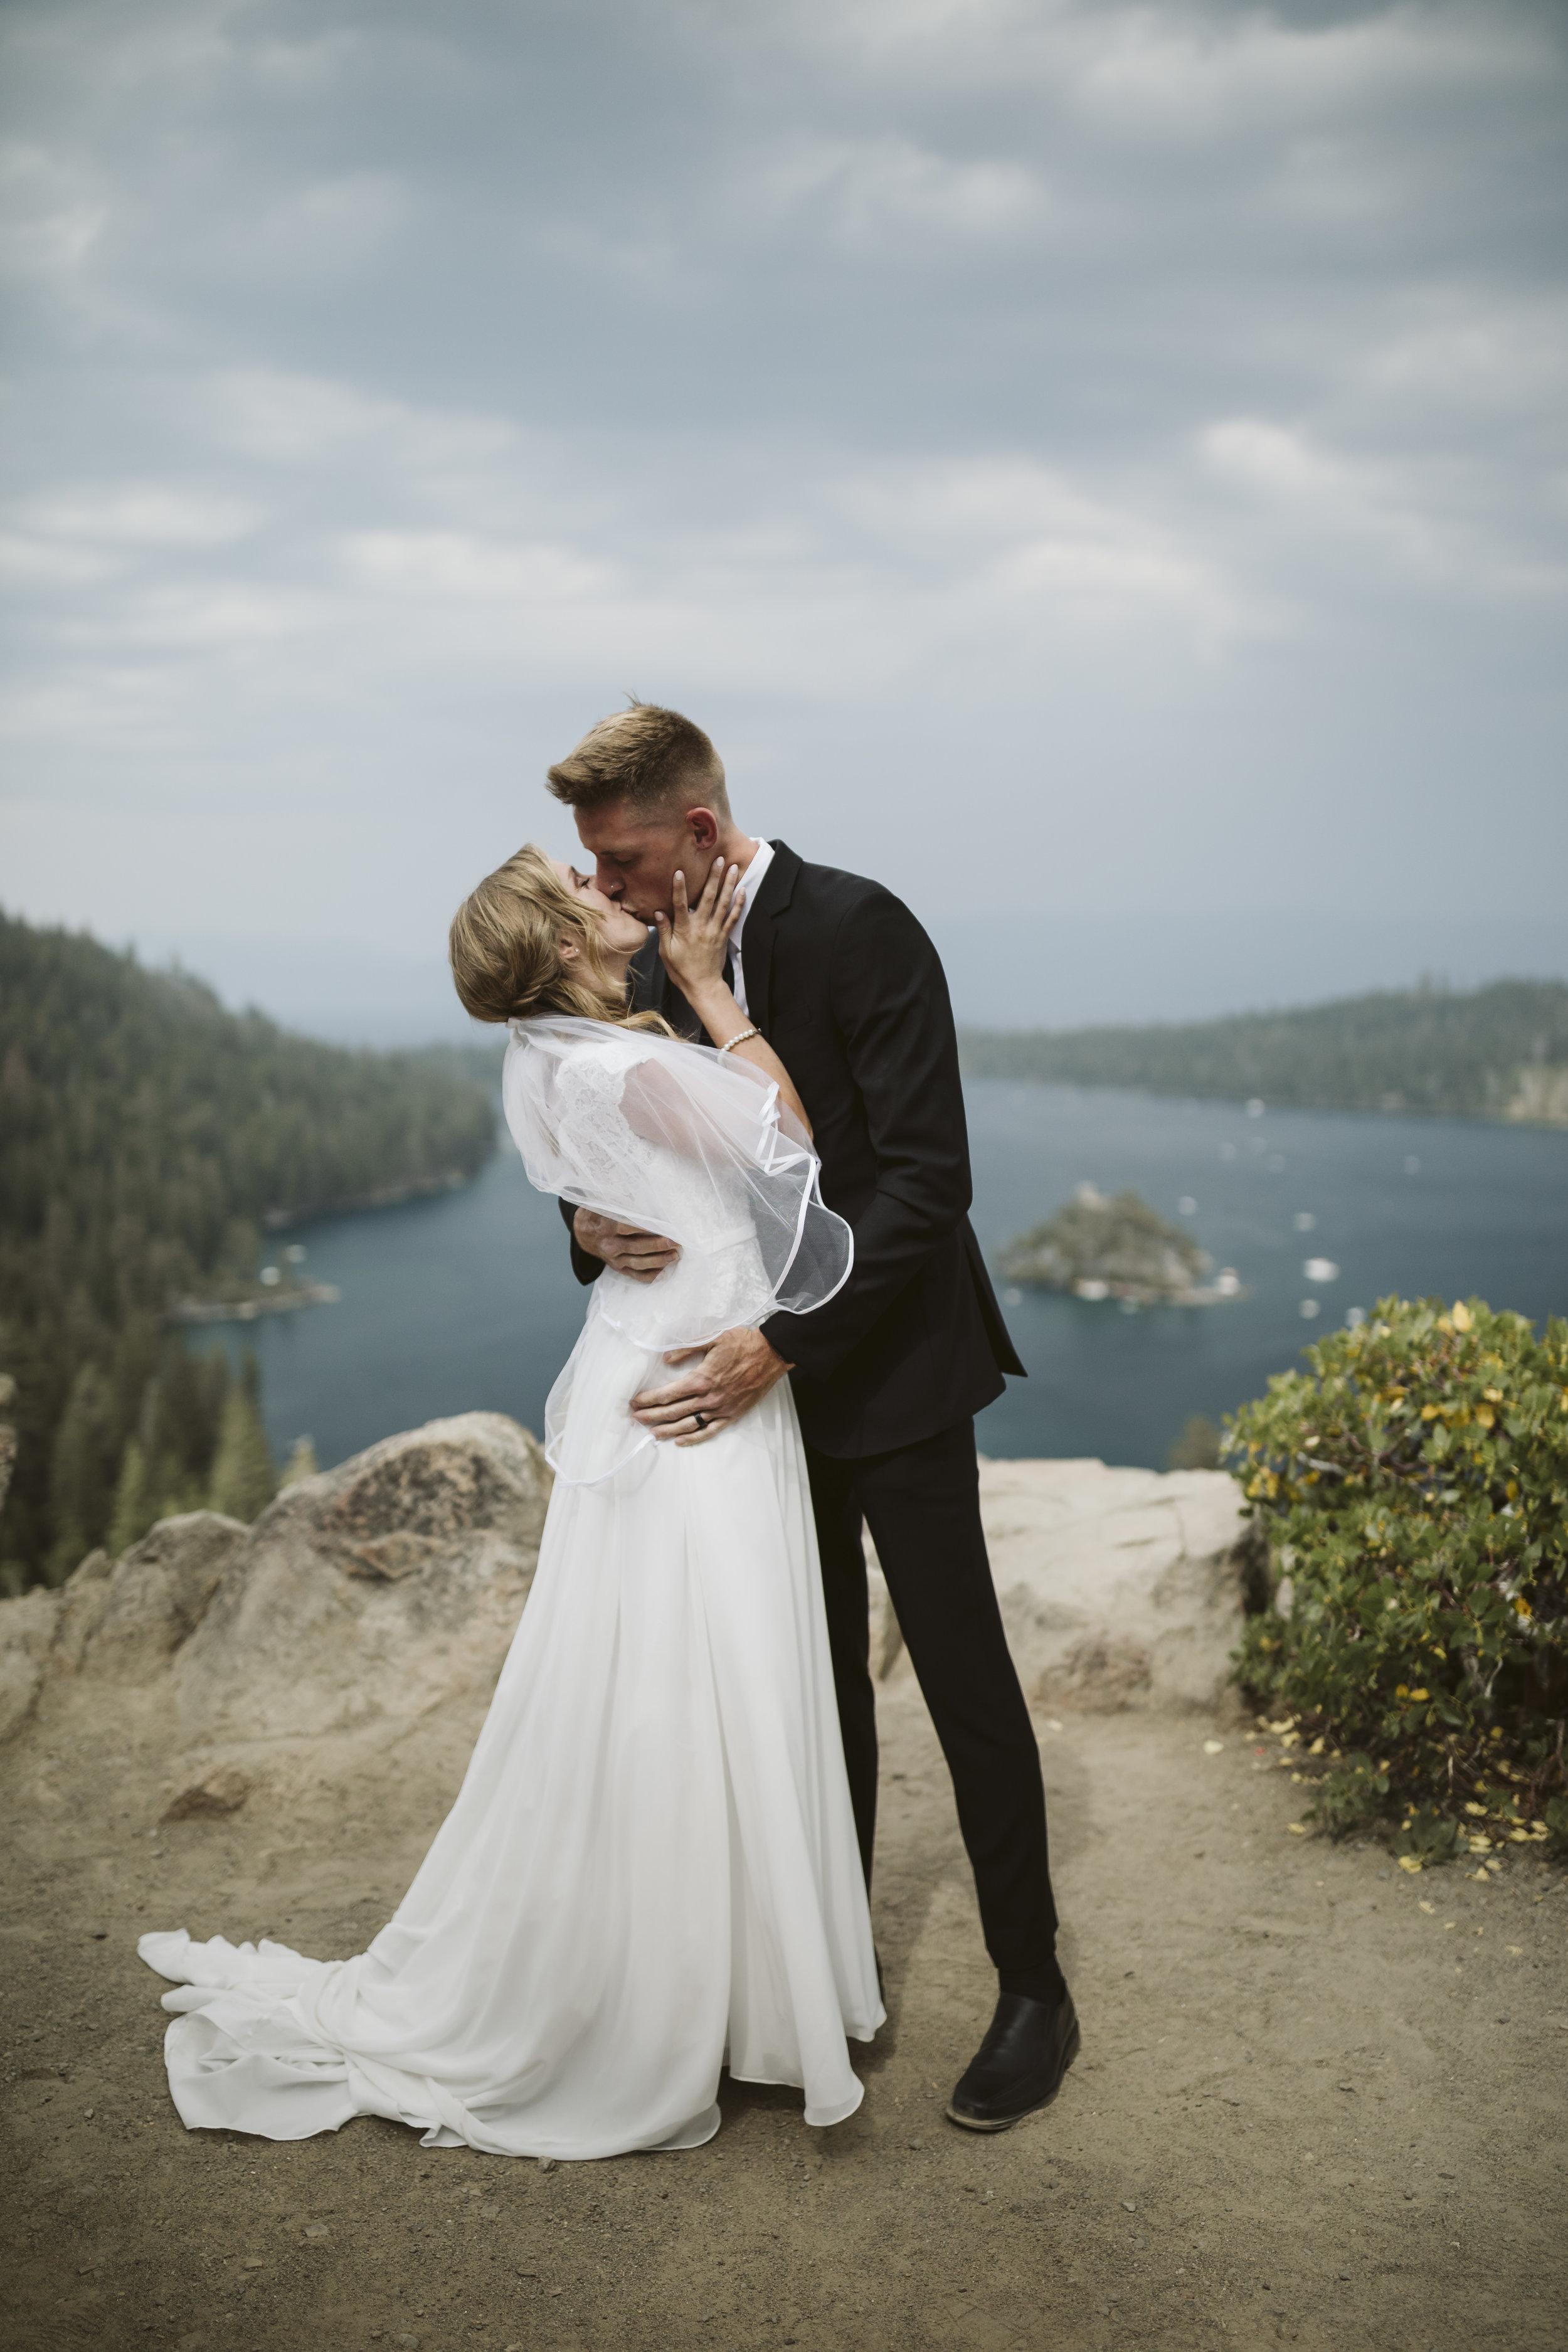 0M7A0759vildphotography-adventurewedding-adventurouswedding-tahoewedding-laketahoewedding-adventureelopement-laketahoeweddingphotographer-wedding-photographer-weddingphotographer-Chase-Sam.jpg